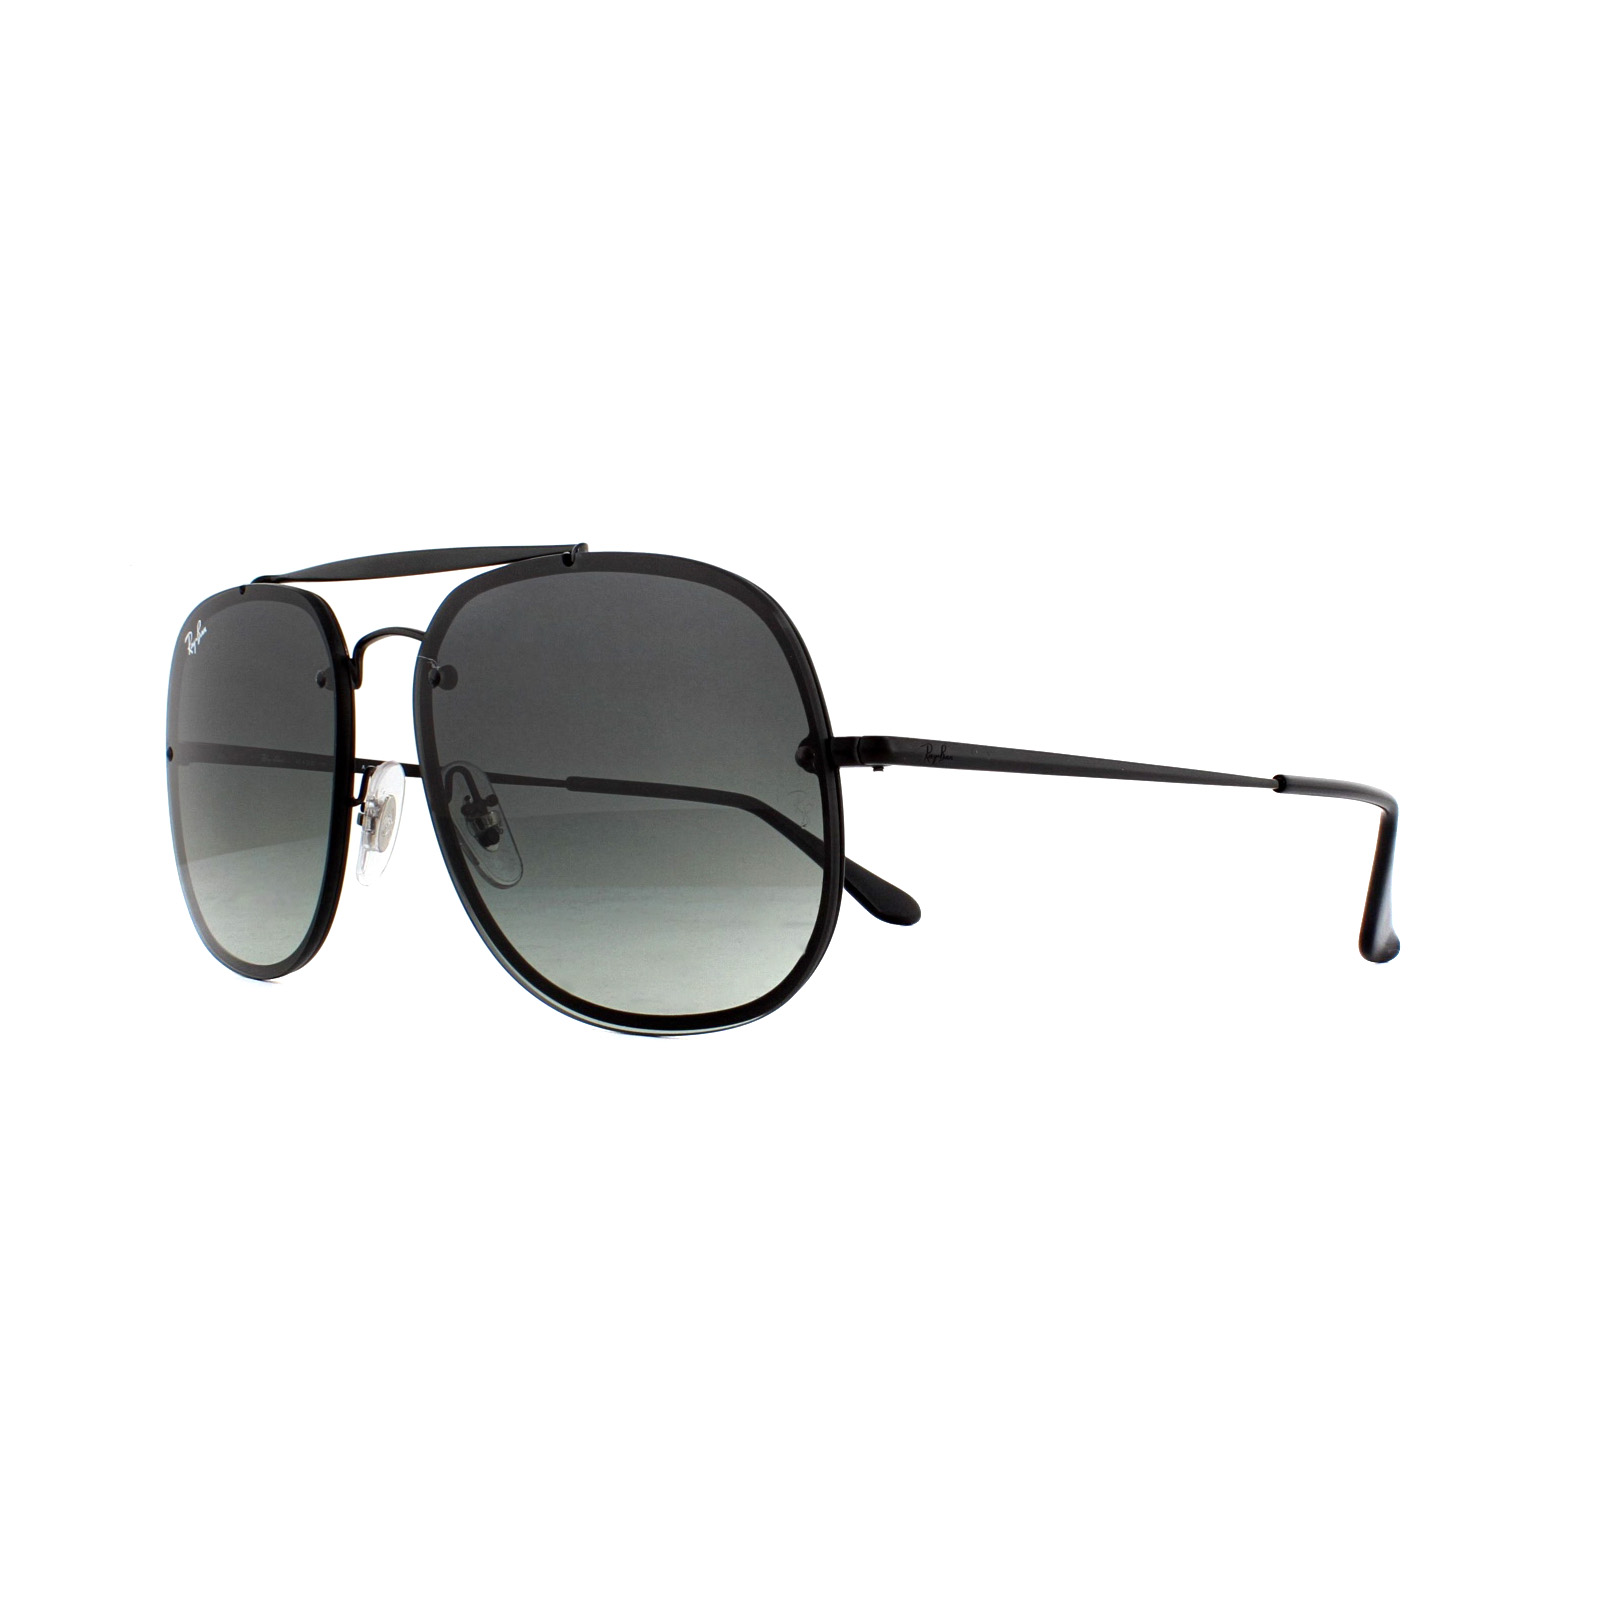 eb04f2471e6ab Sentinel Ray-Ban Sunglasses Blaze The General RB3583N 153 11 Demigloss  Black Light Grey G